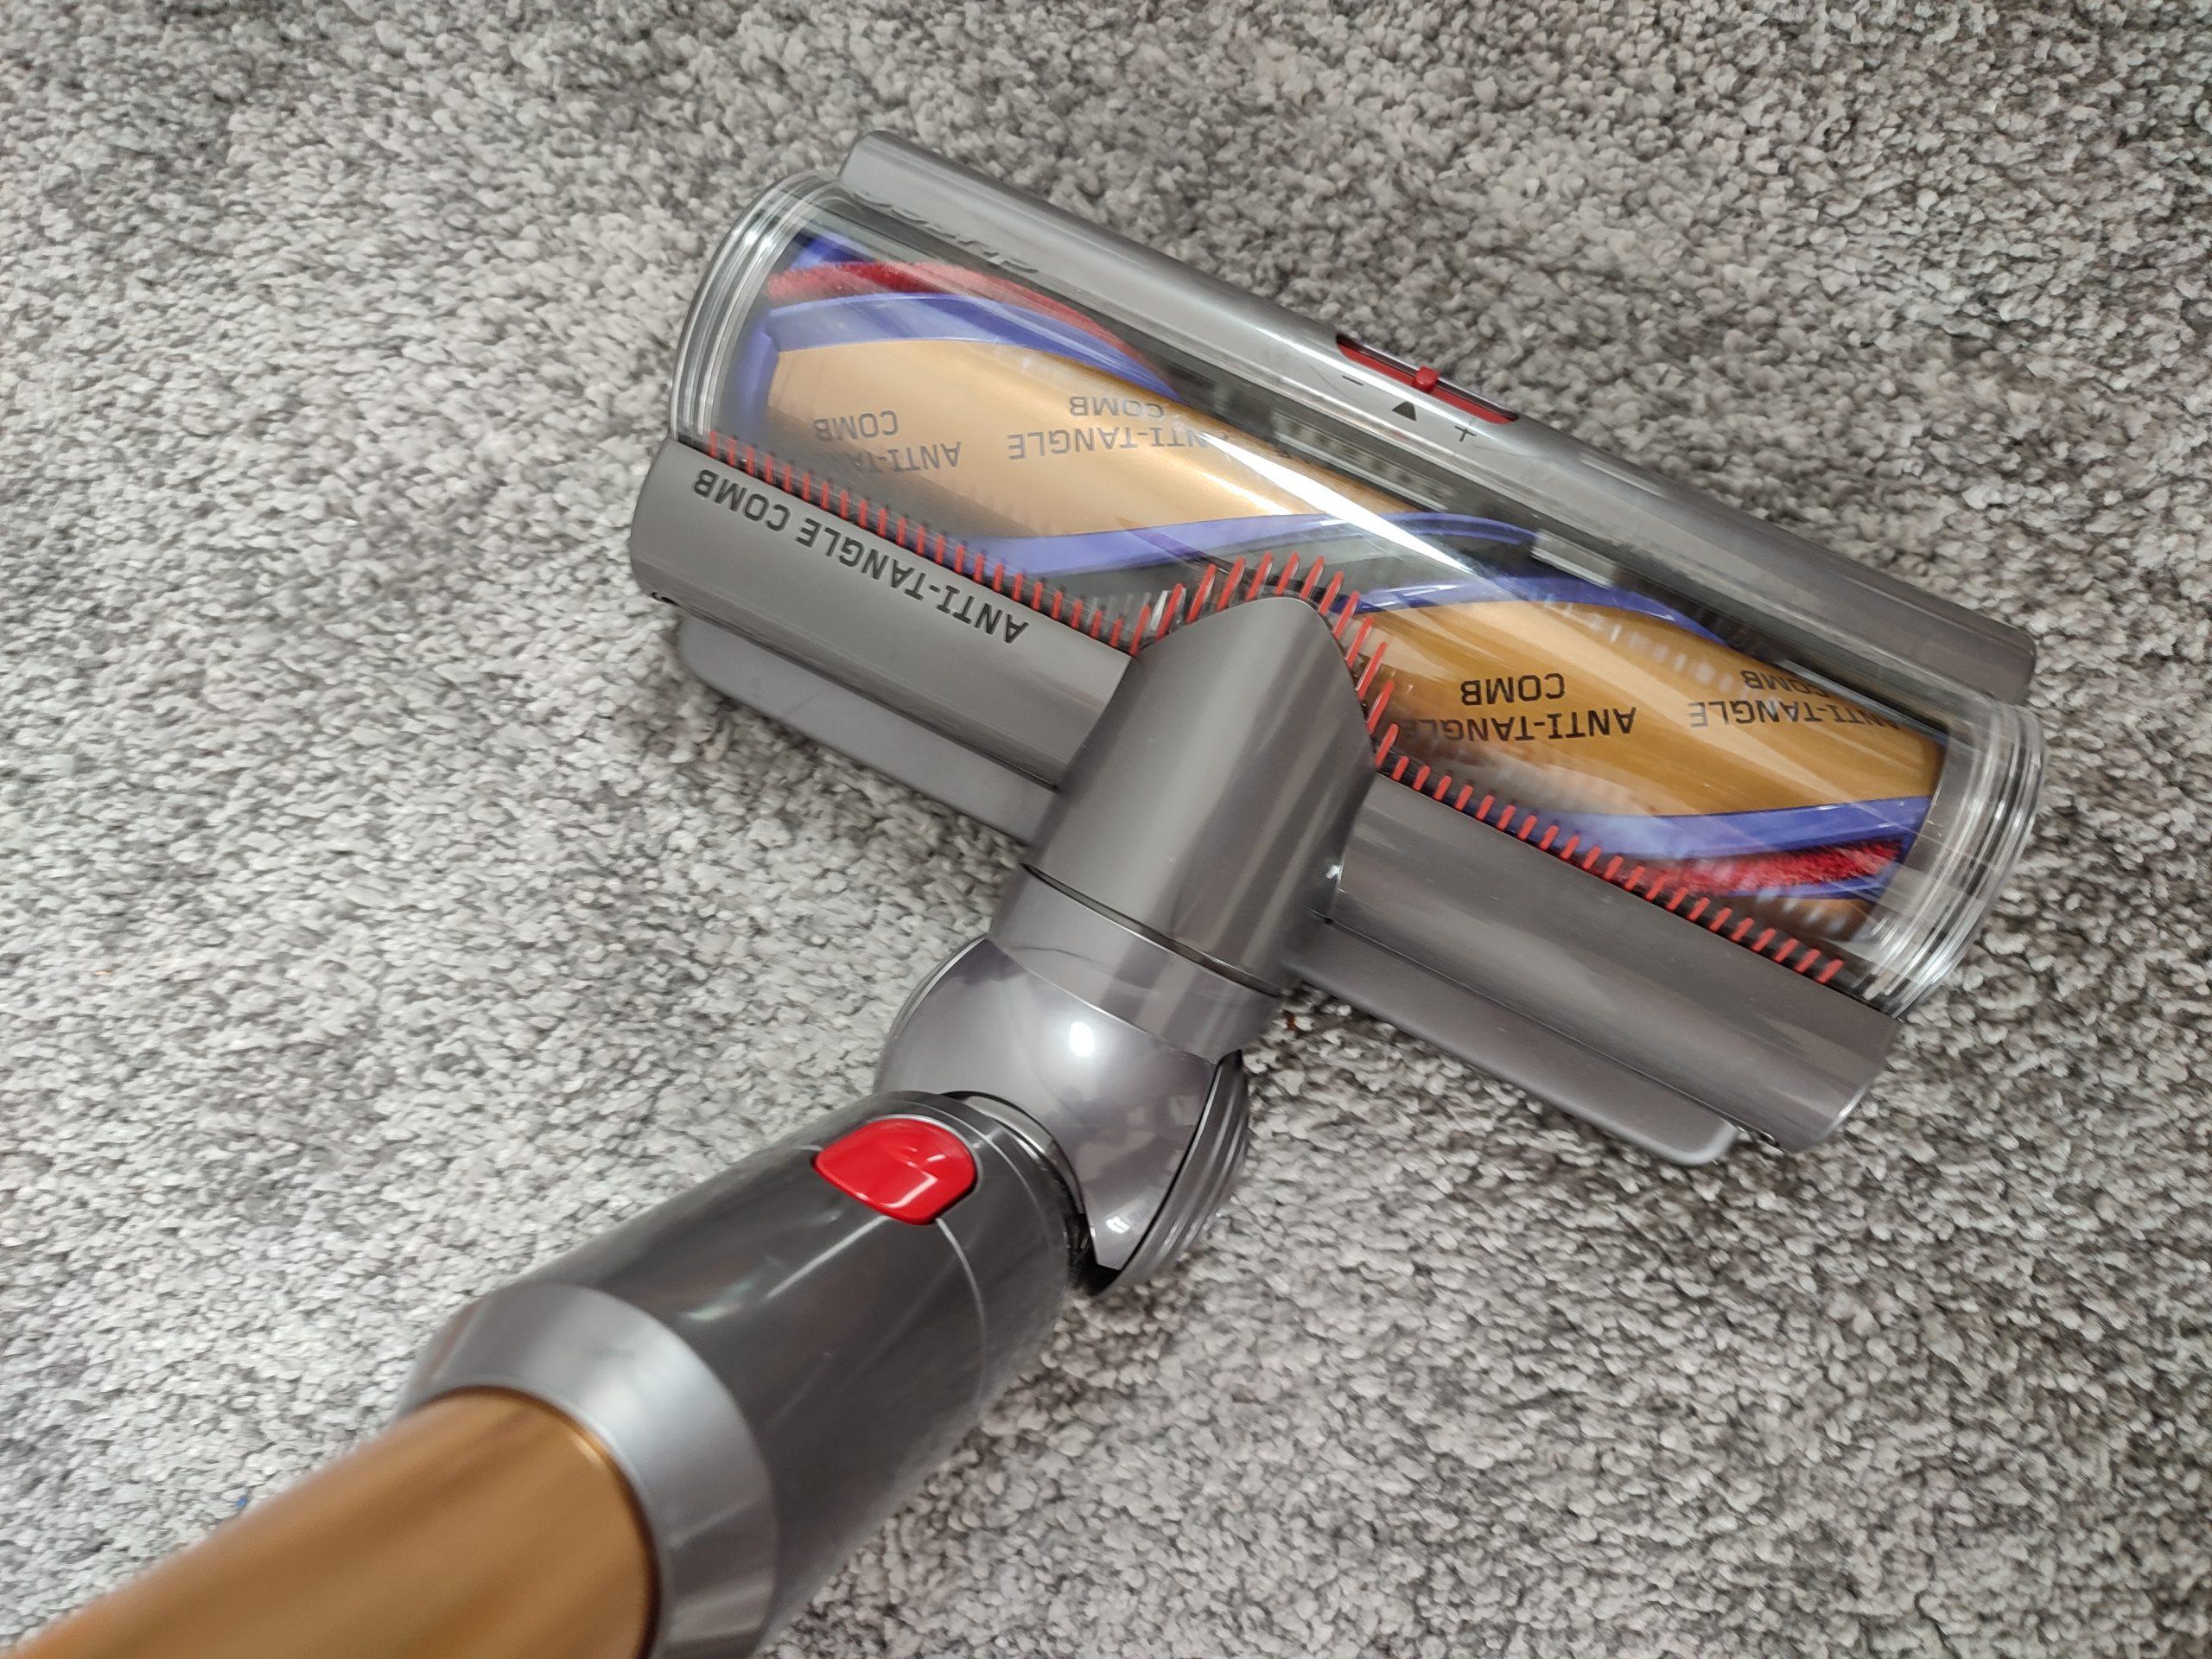 Dyson V15 Detect Akkusauger Torque Drive auf Teppich